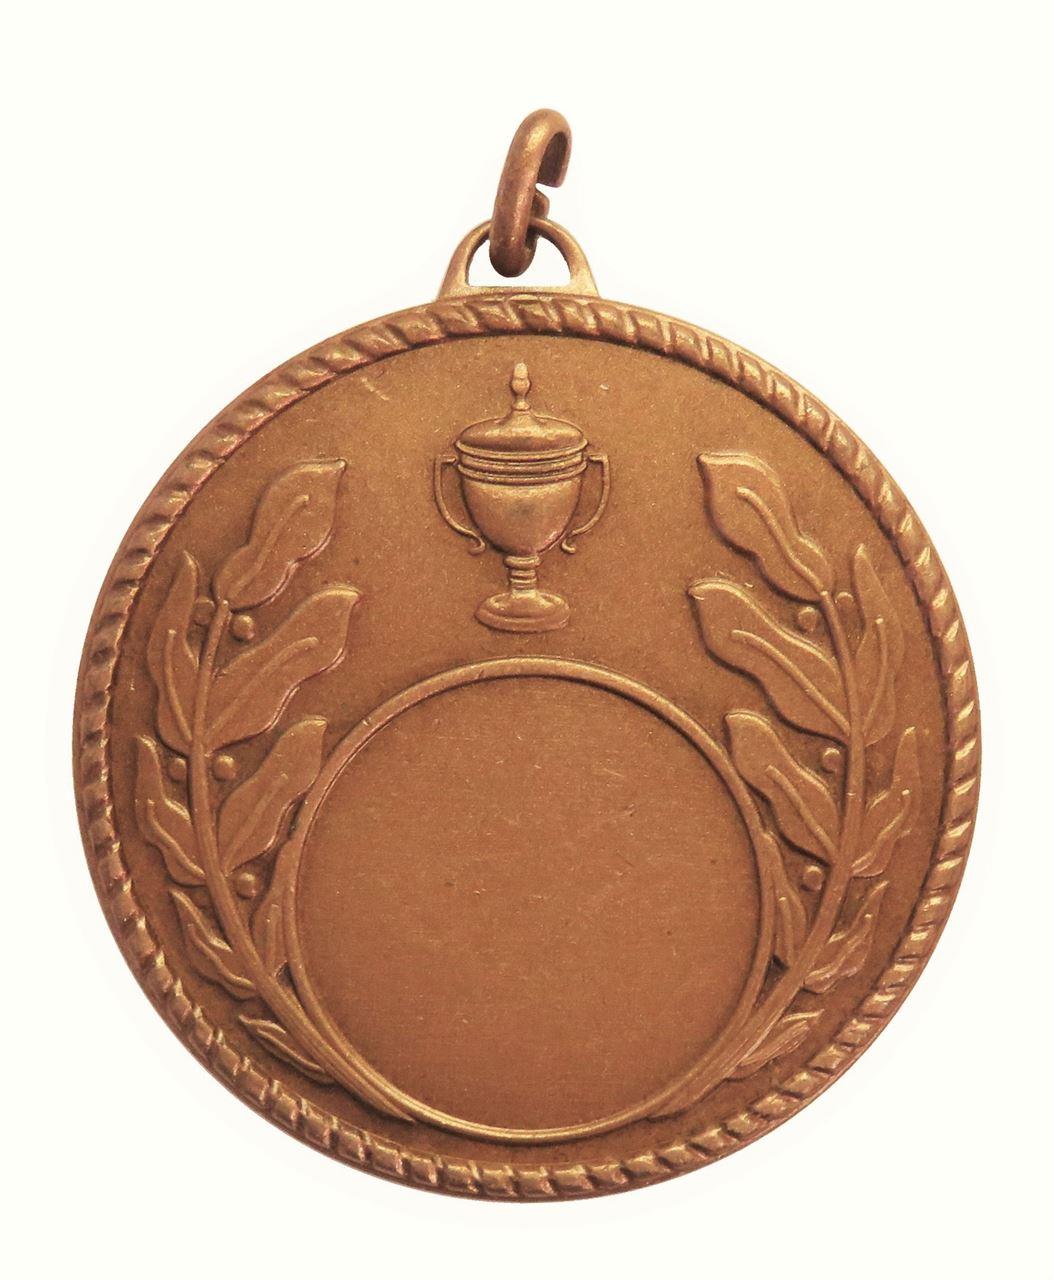 Copper Quality Laurel & Cup Medal (size: 50mm) - 5804E